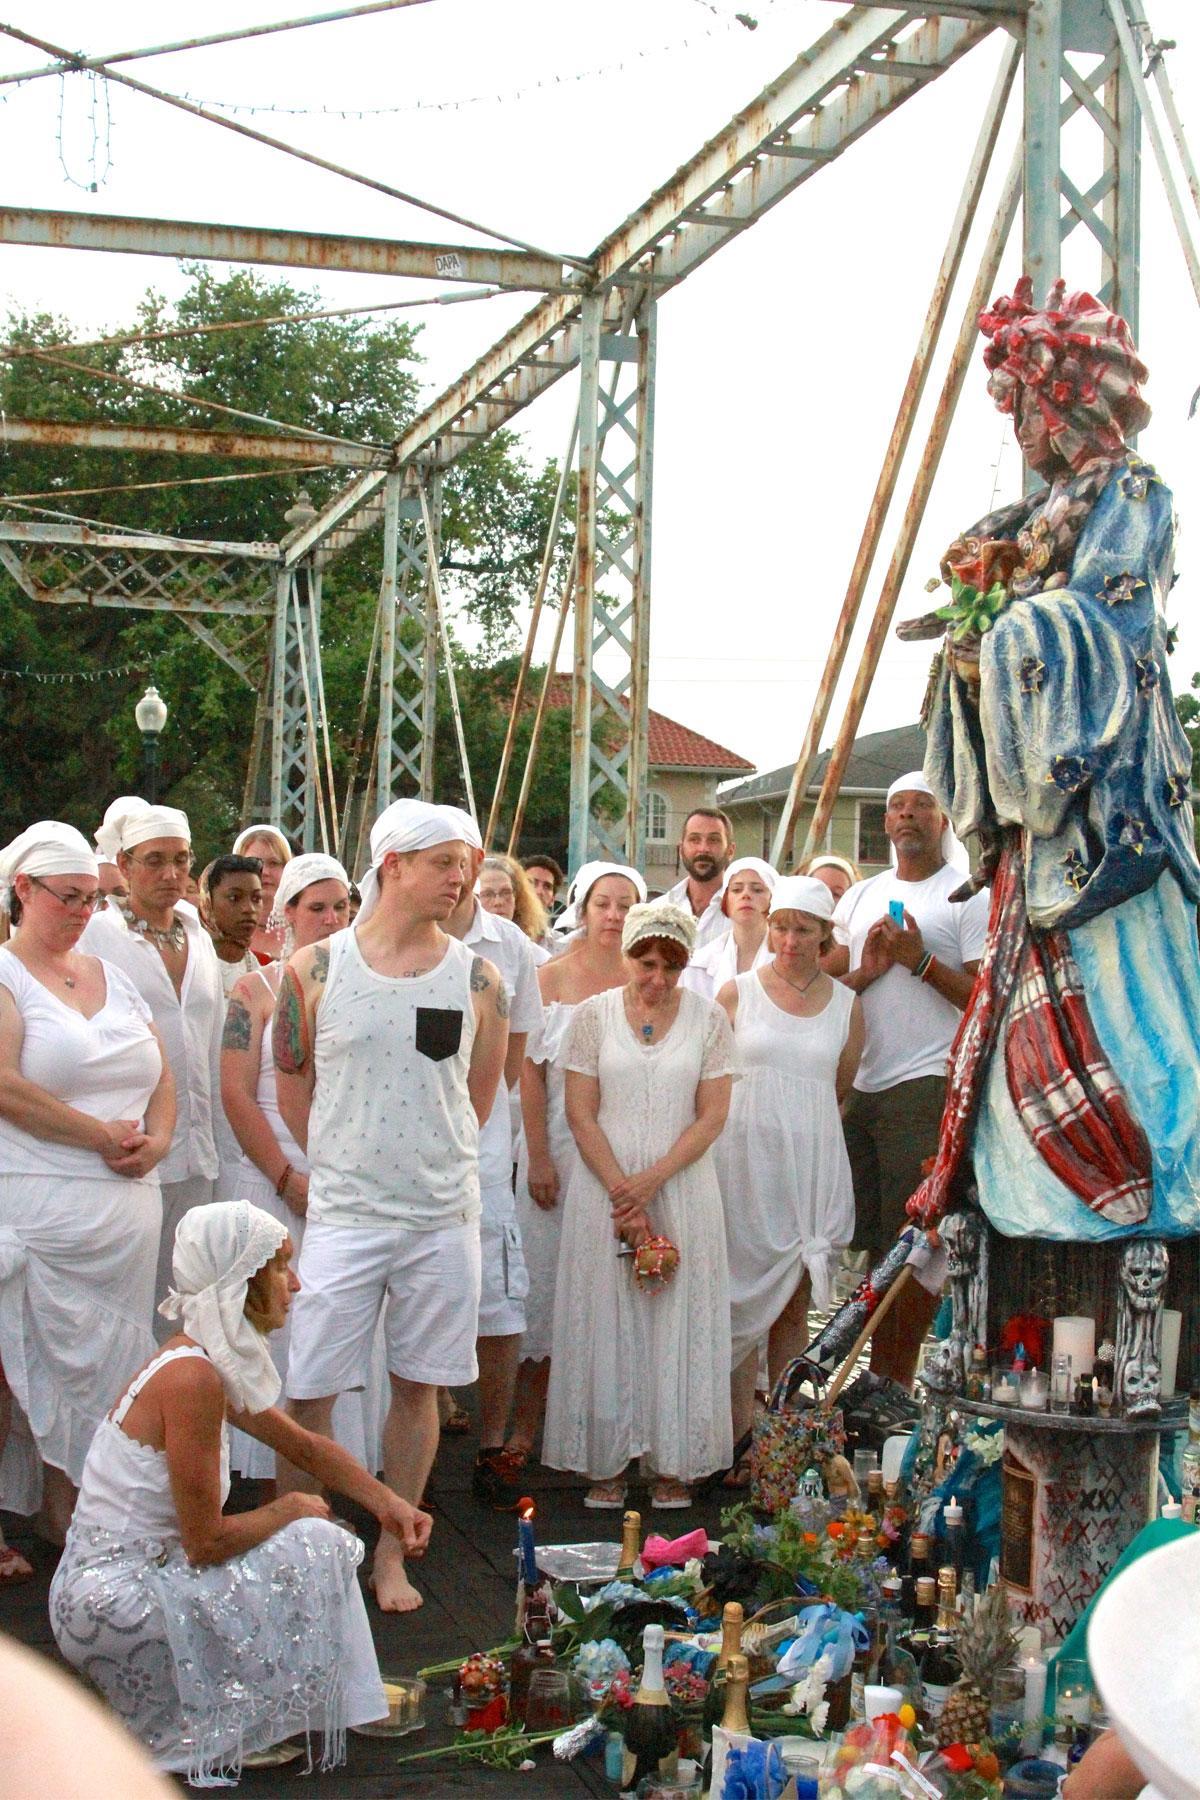 How To Participate In Voodoo Vodou Ceremonies In New Orleans